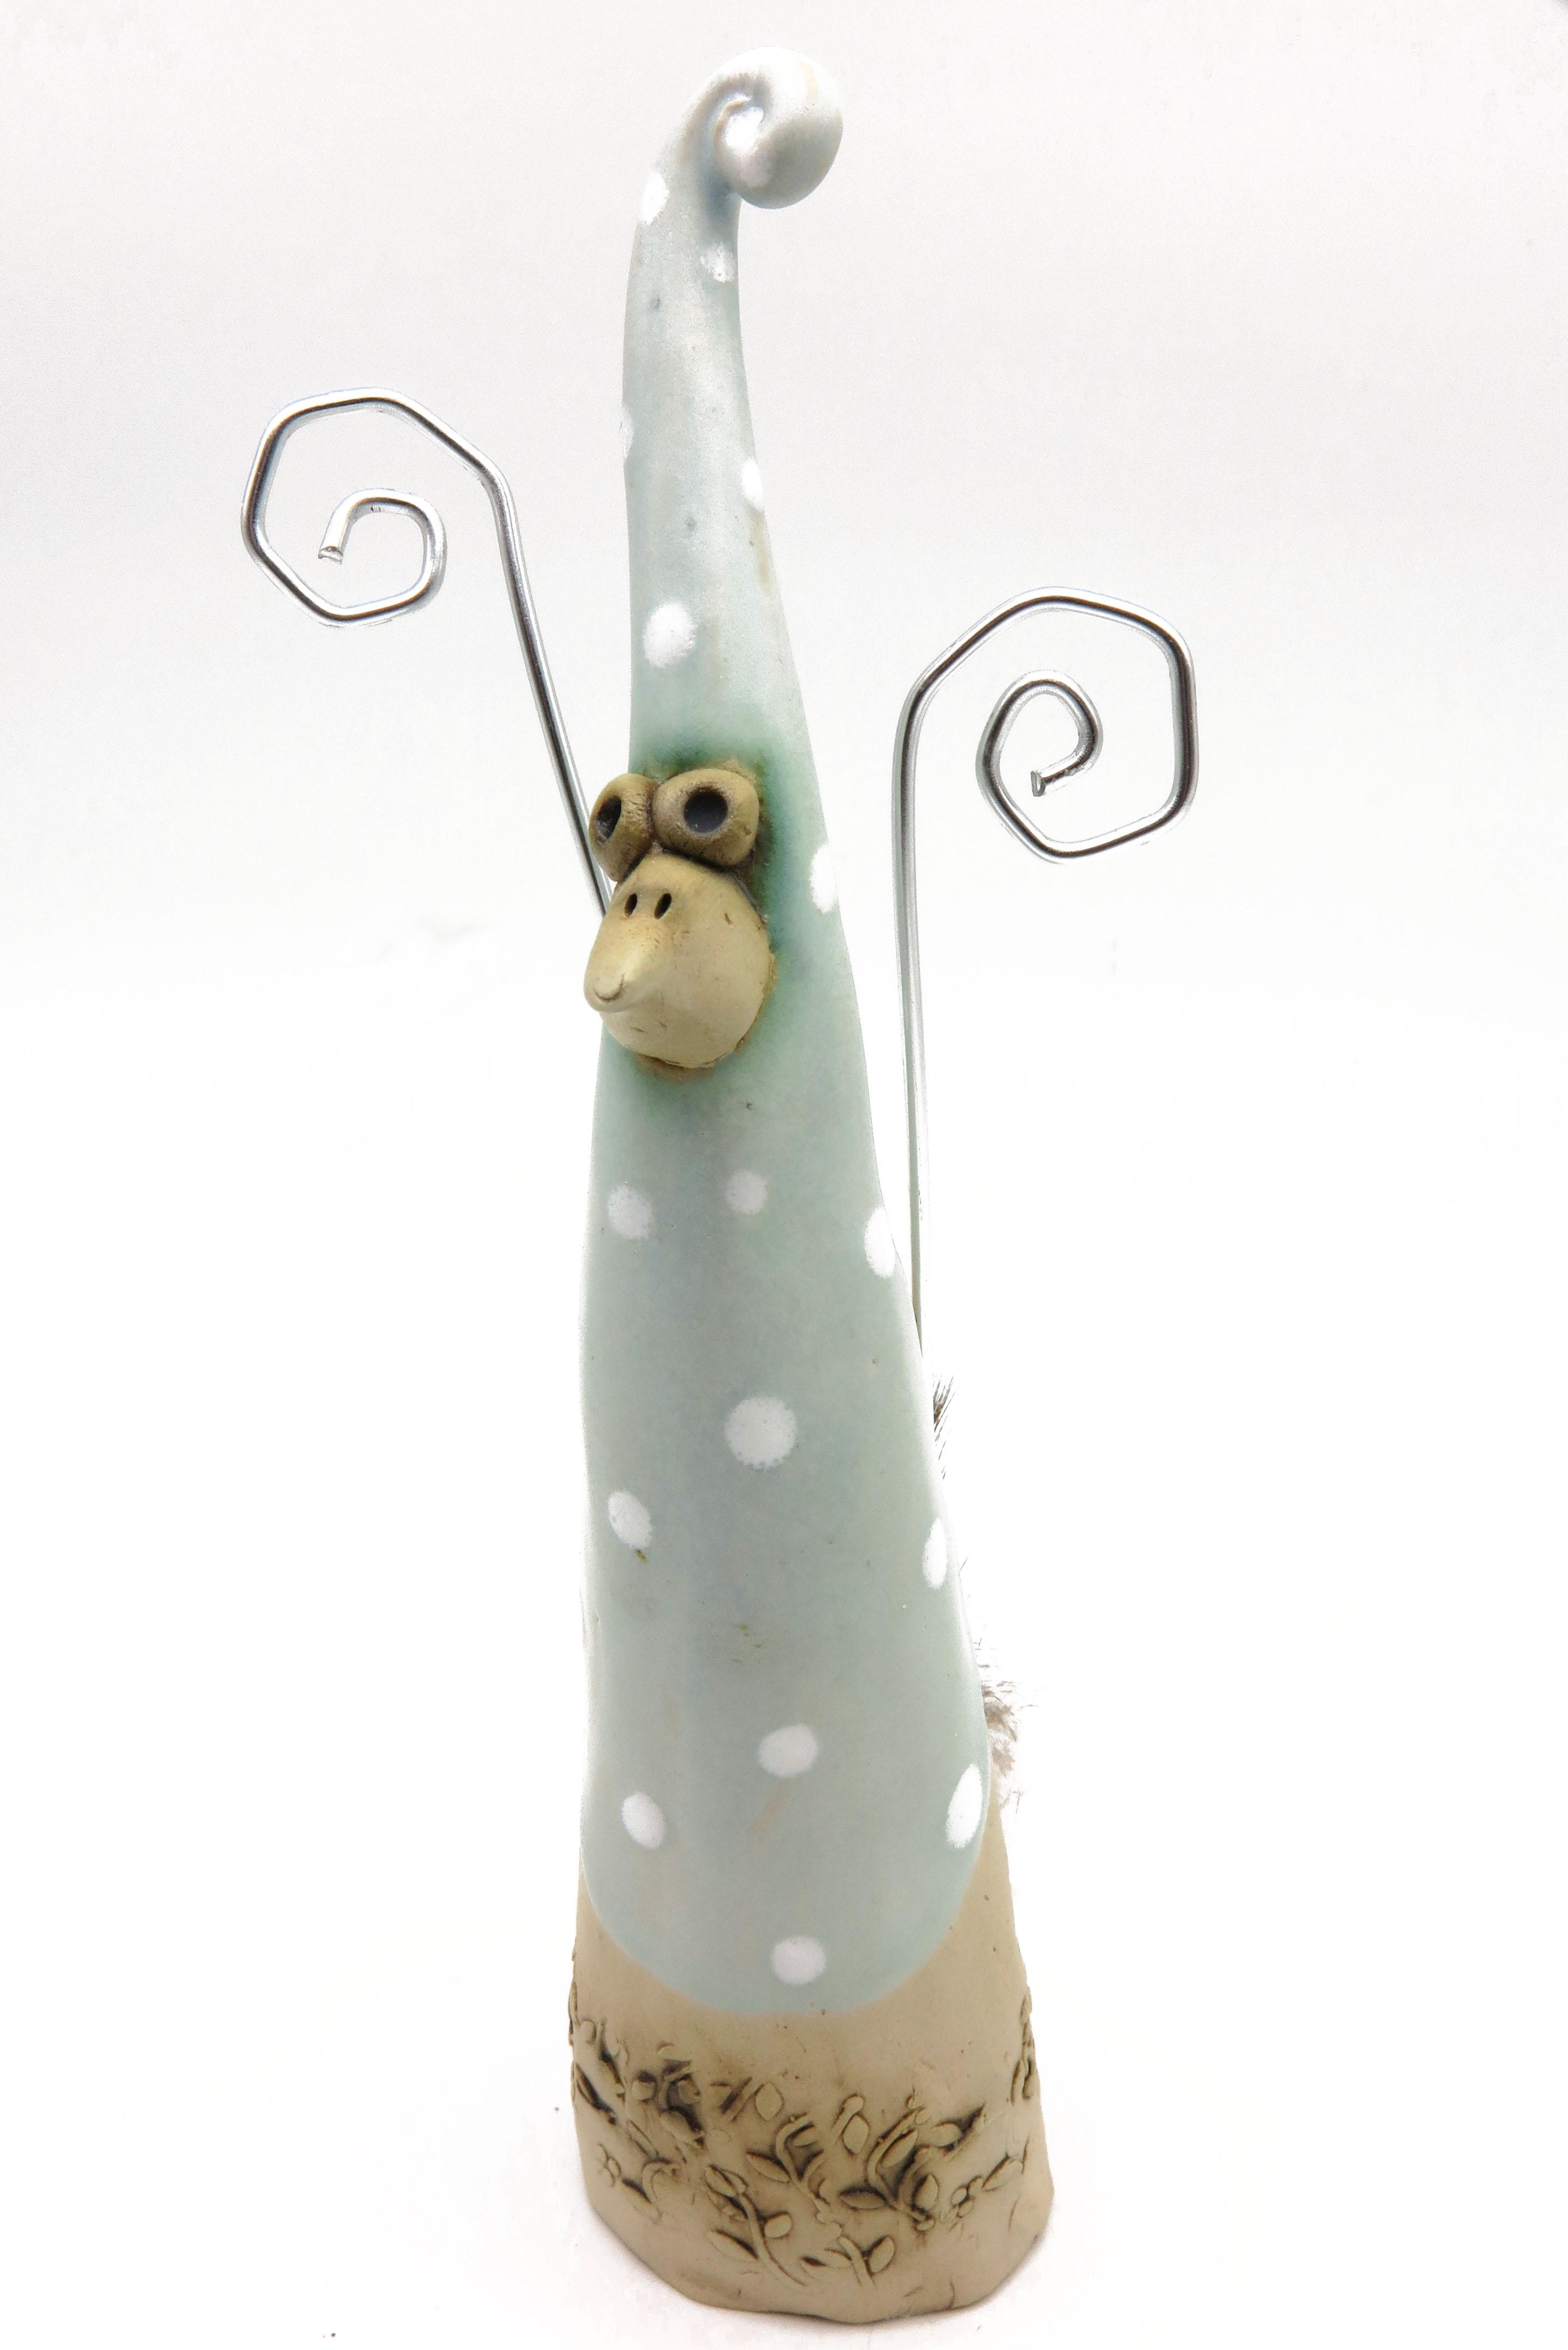 Schräger Vogel pastellmint/L 20 cm